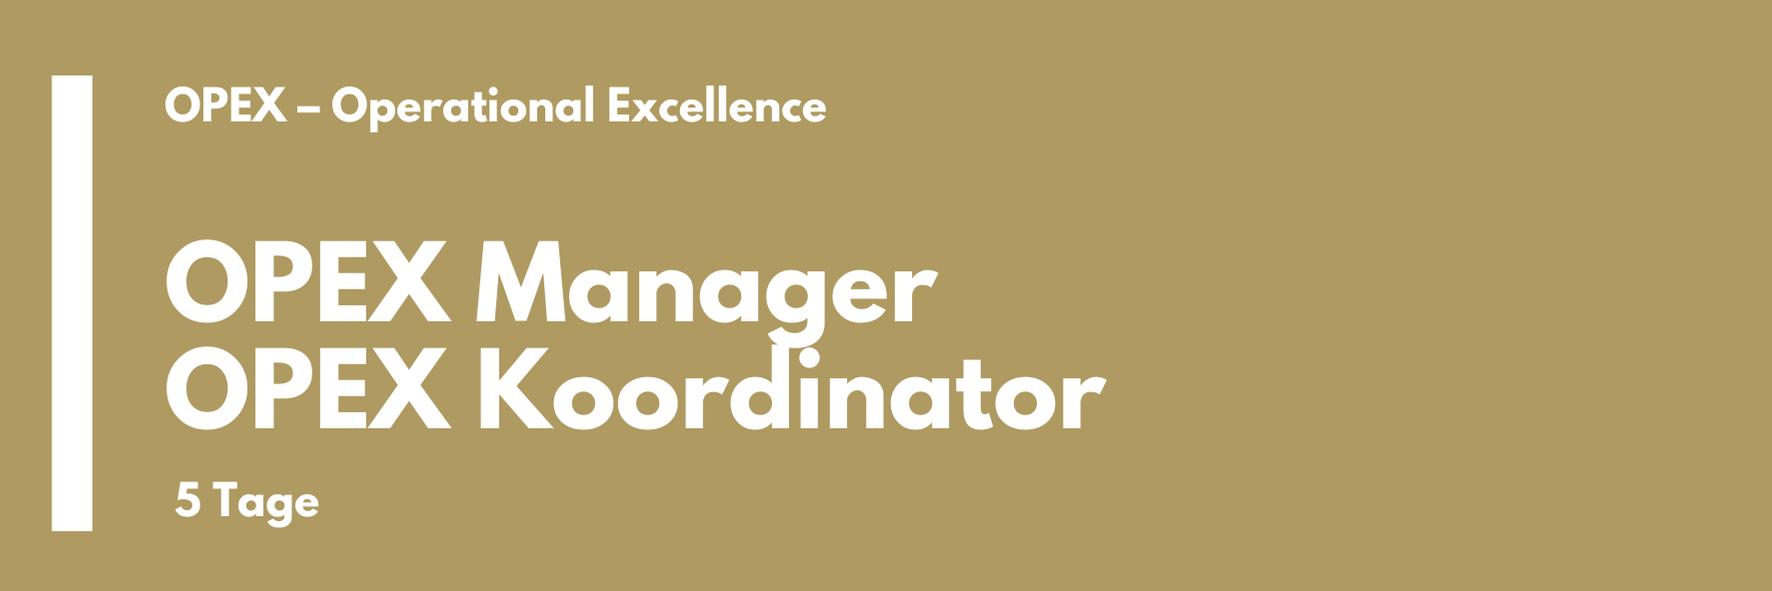 OPEX Manager | OPEX Koordinator